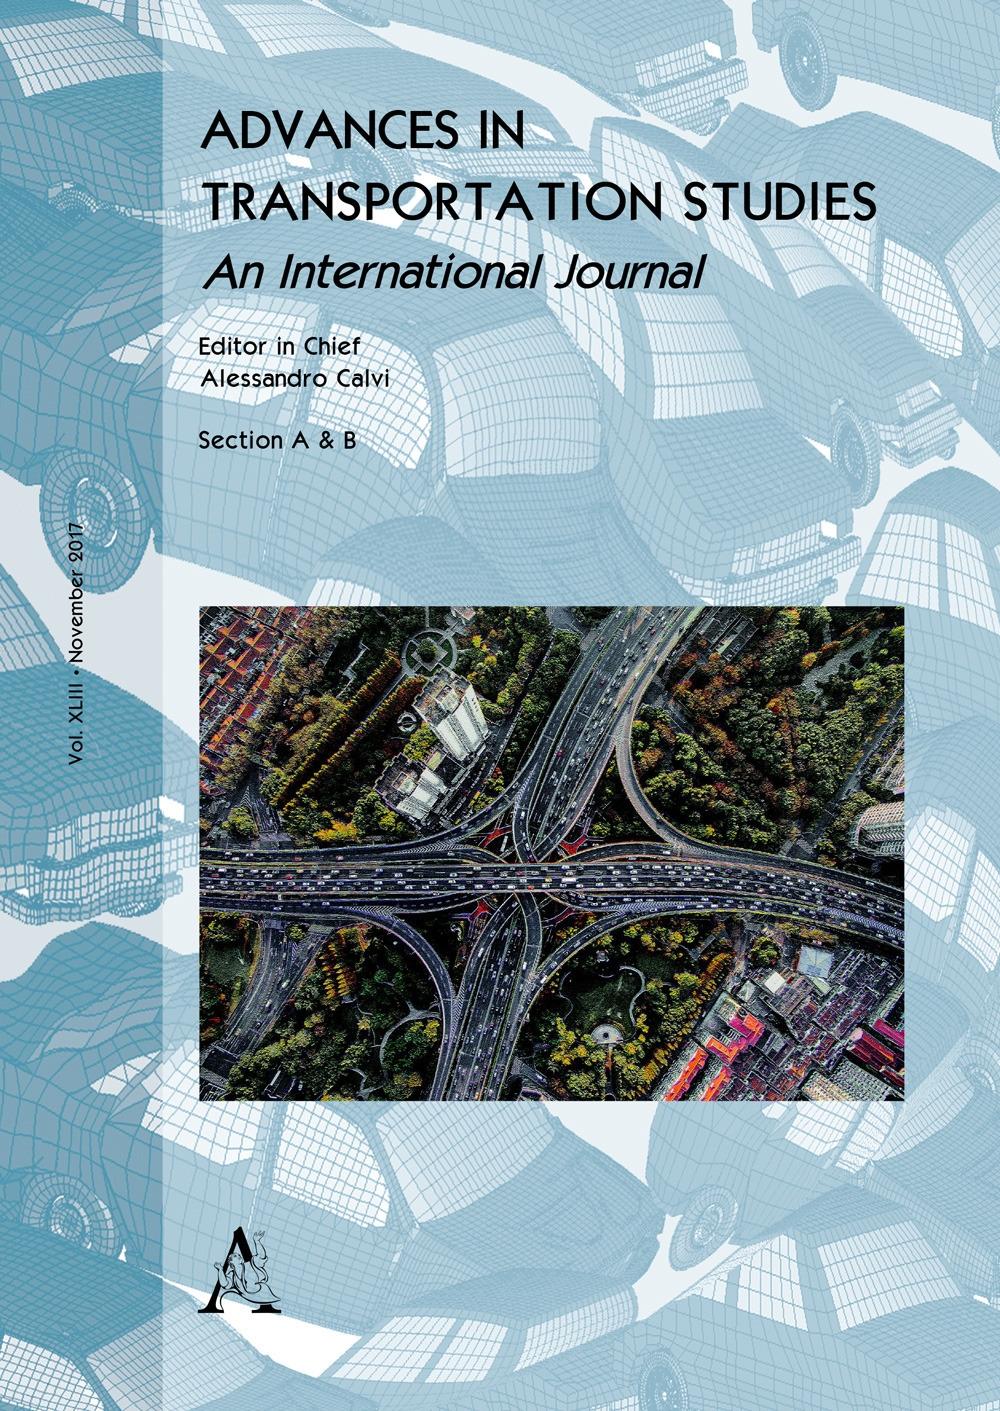 dvances in transportation studies. An international journal (2017). Vol. 33